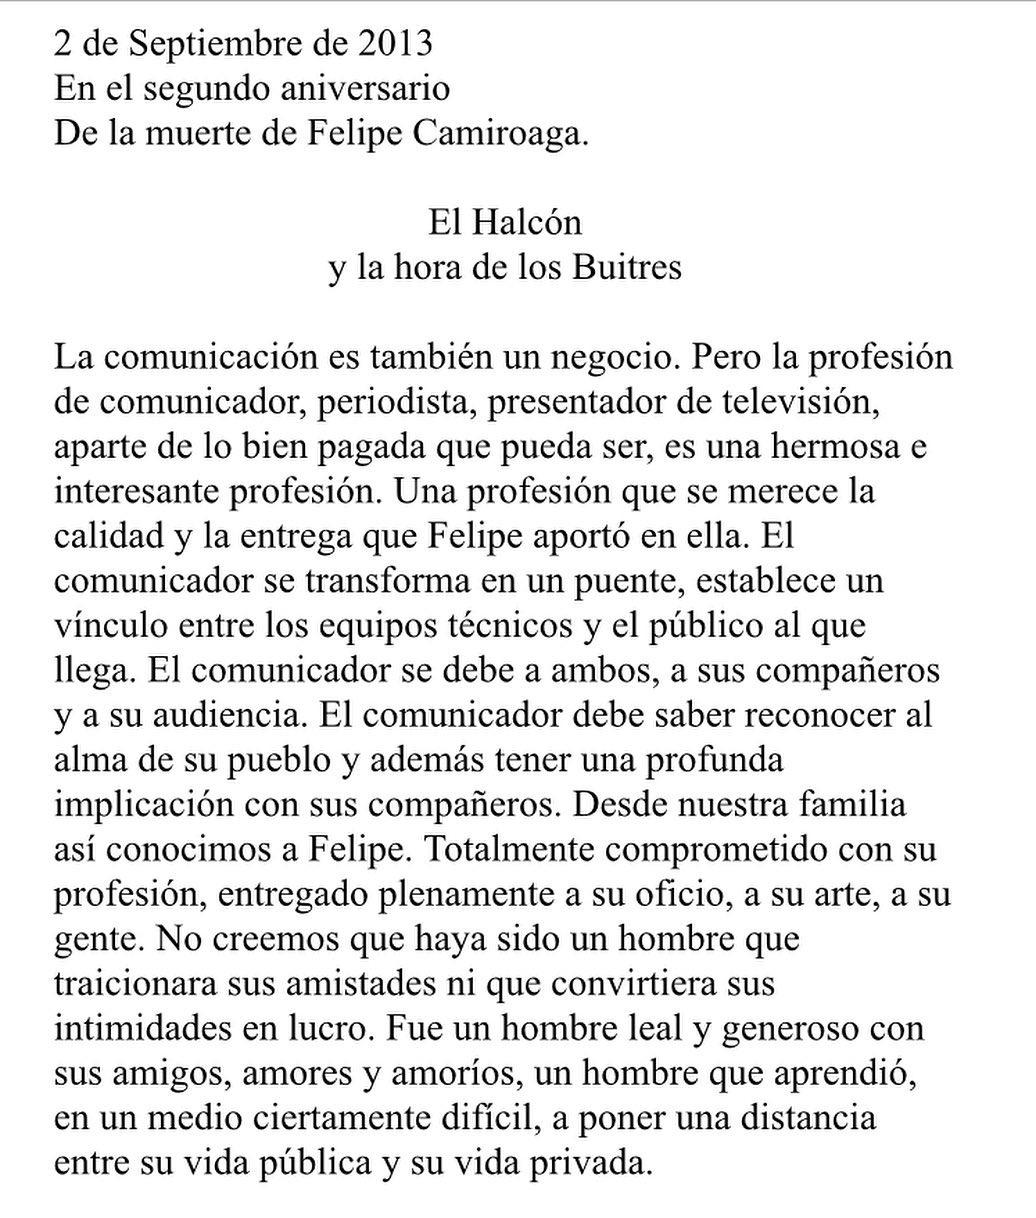 Carta Que Compartio Hermana De Felipe Camiroaga